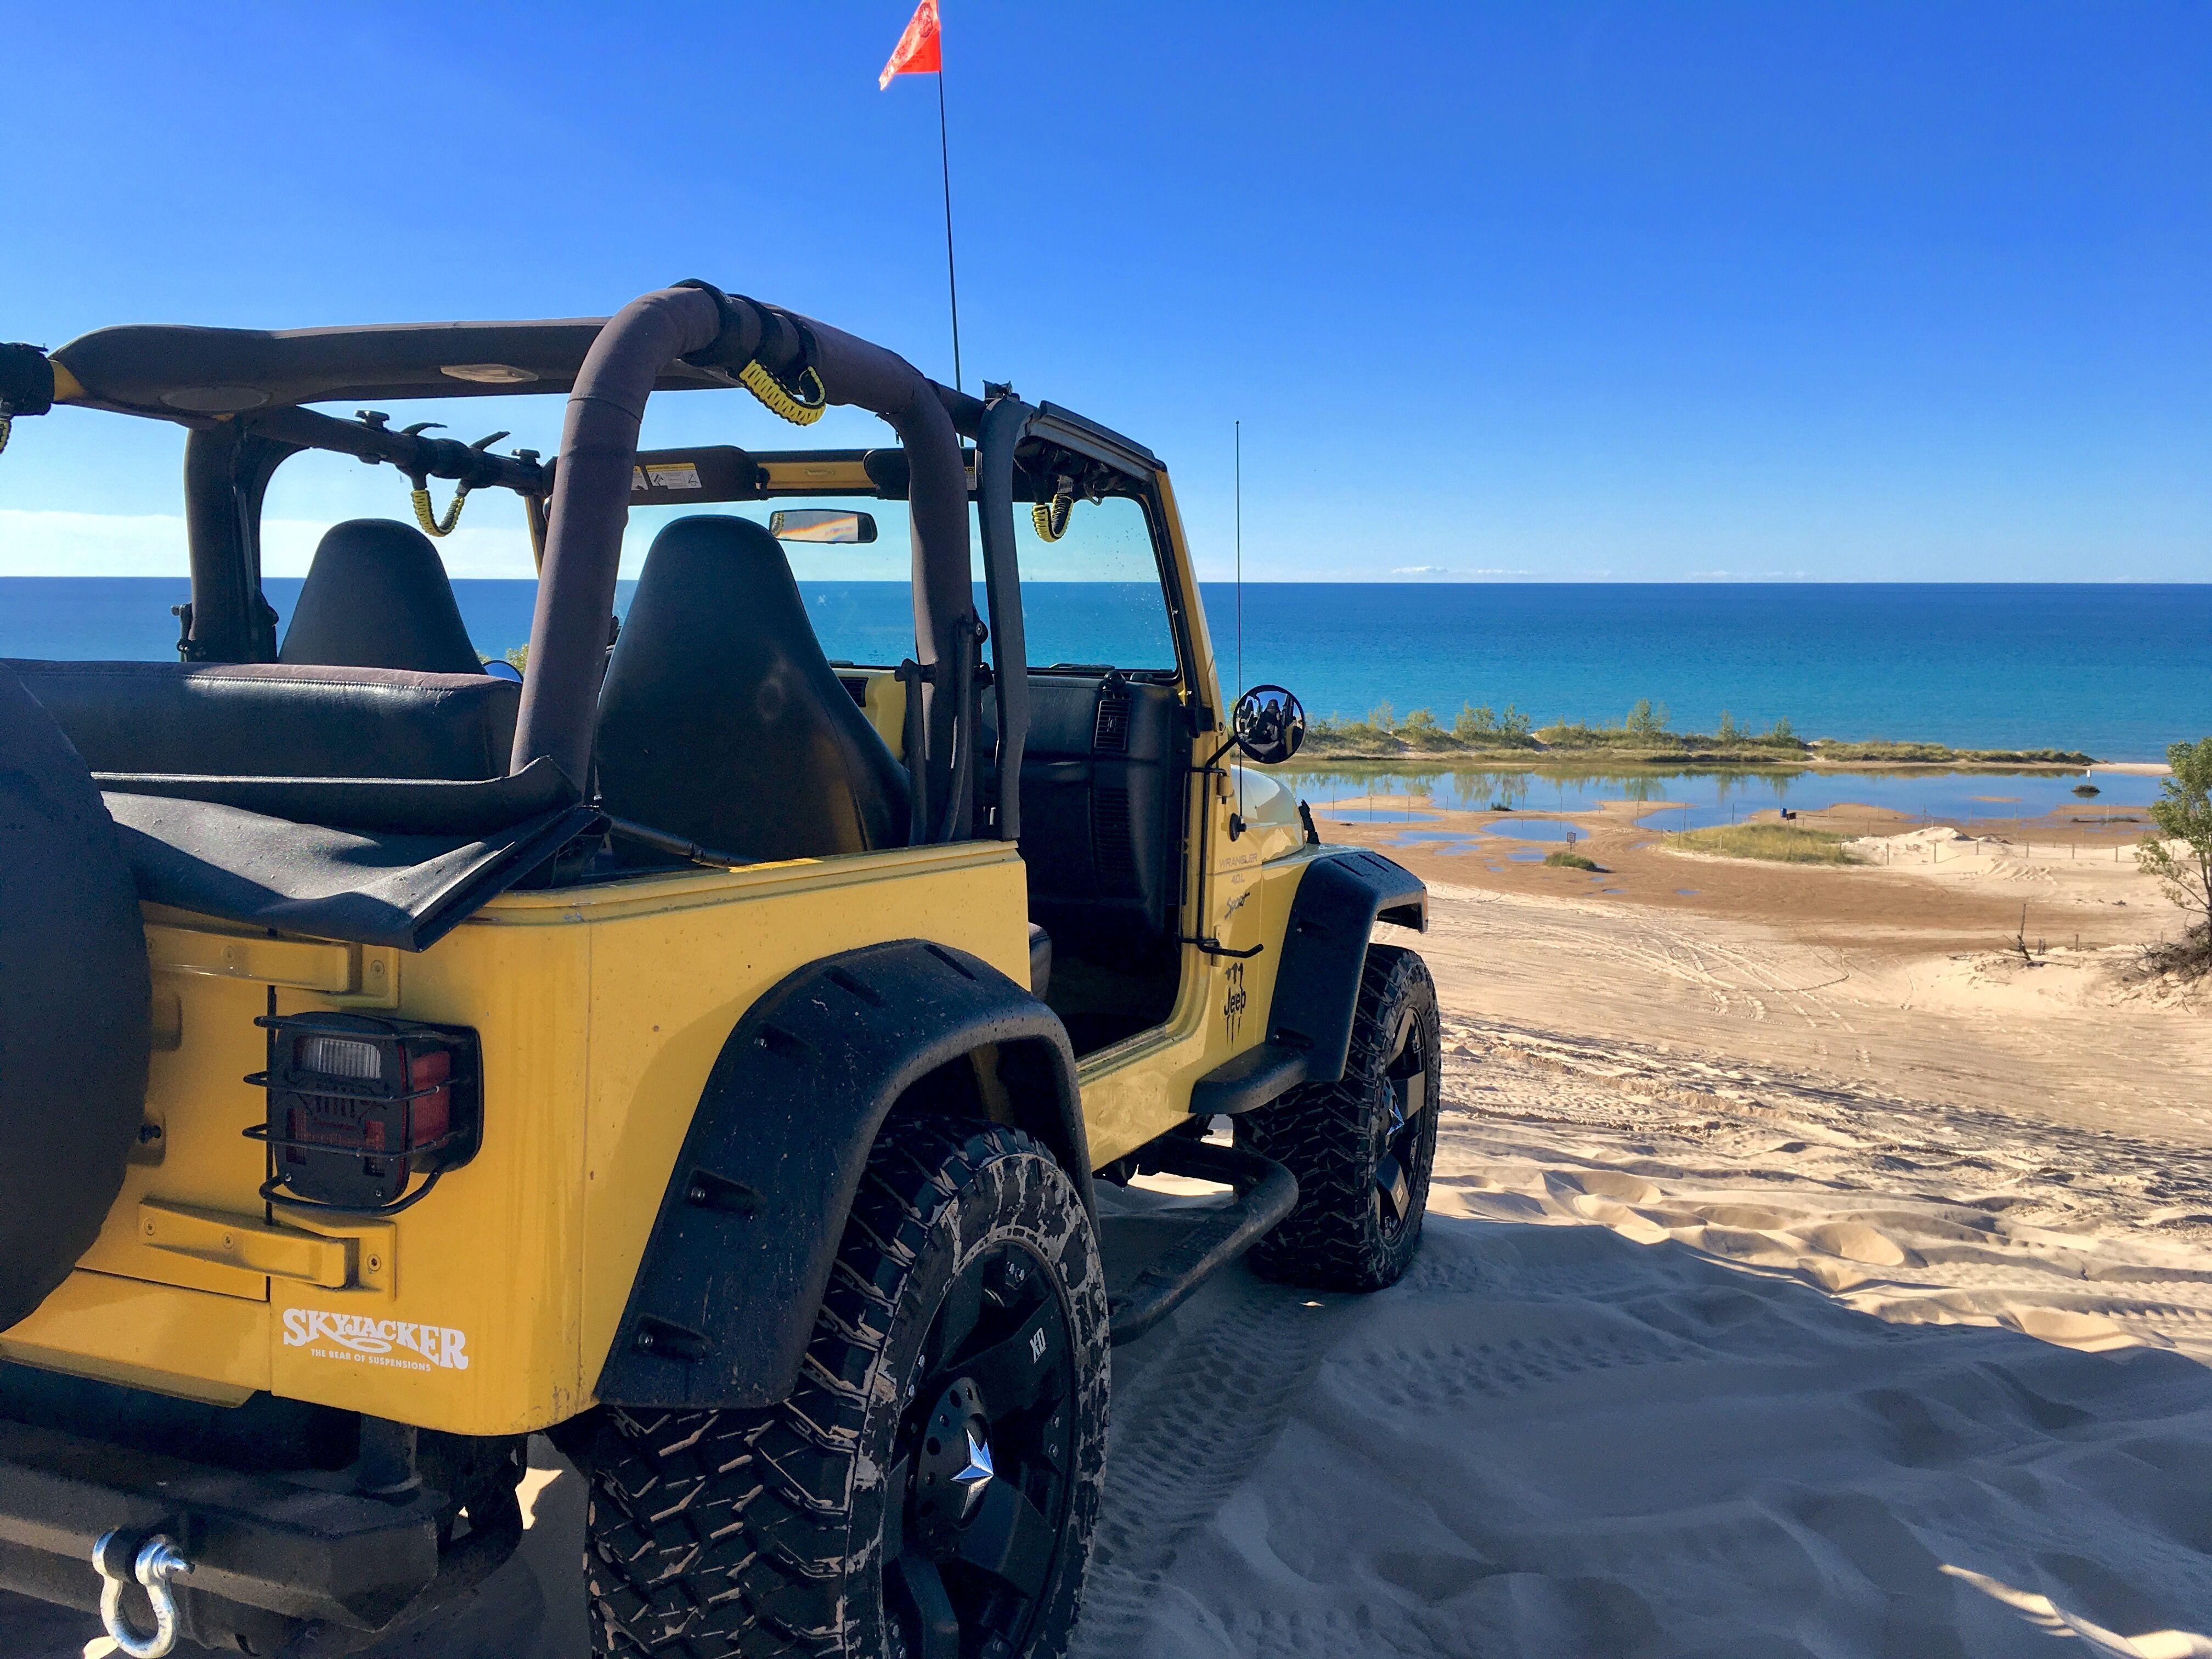 Brock S Jeep Silver Lake Sand Dunes 9 30 2017 Goruntuler